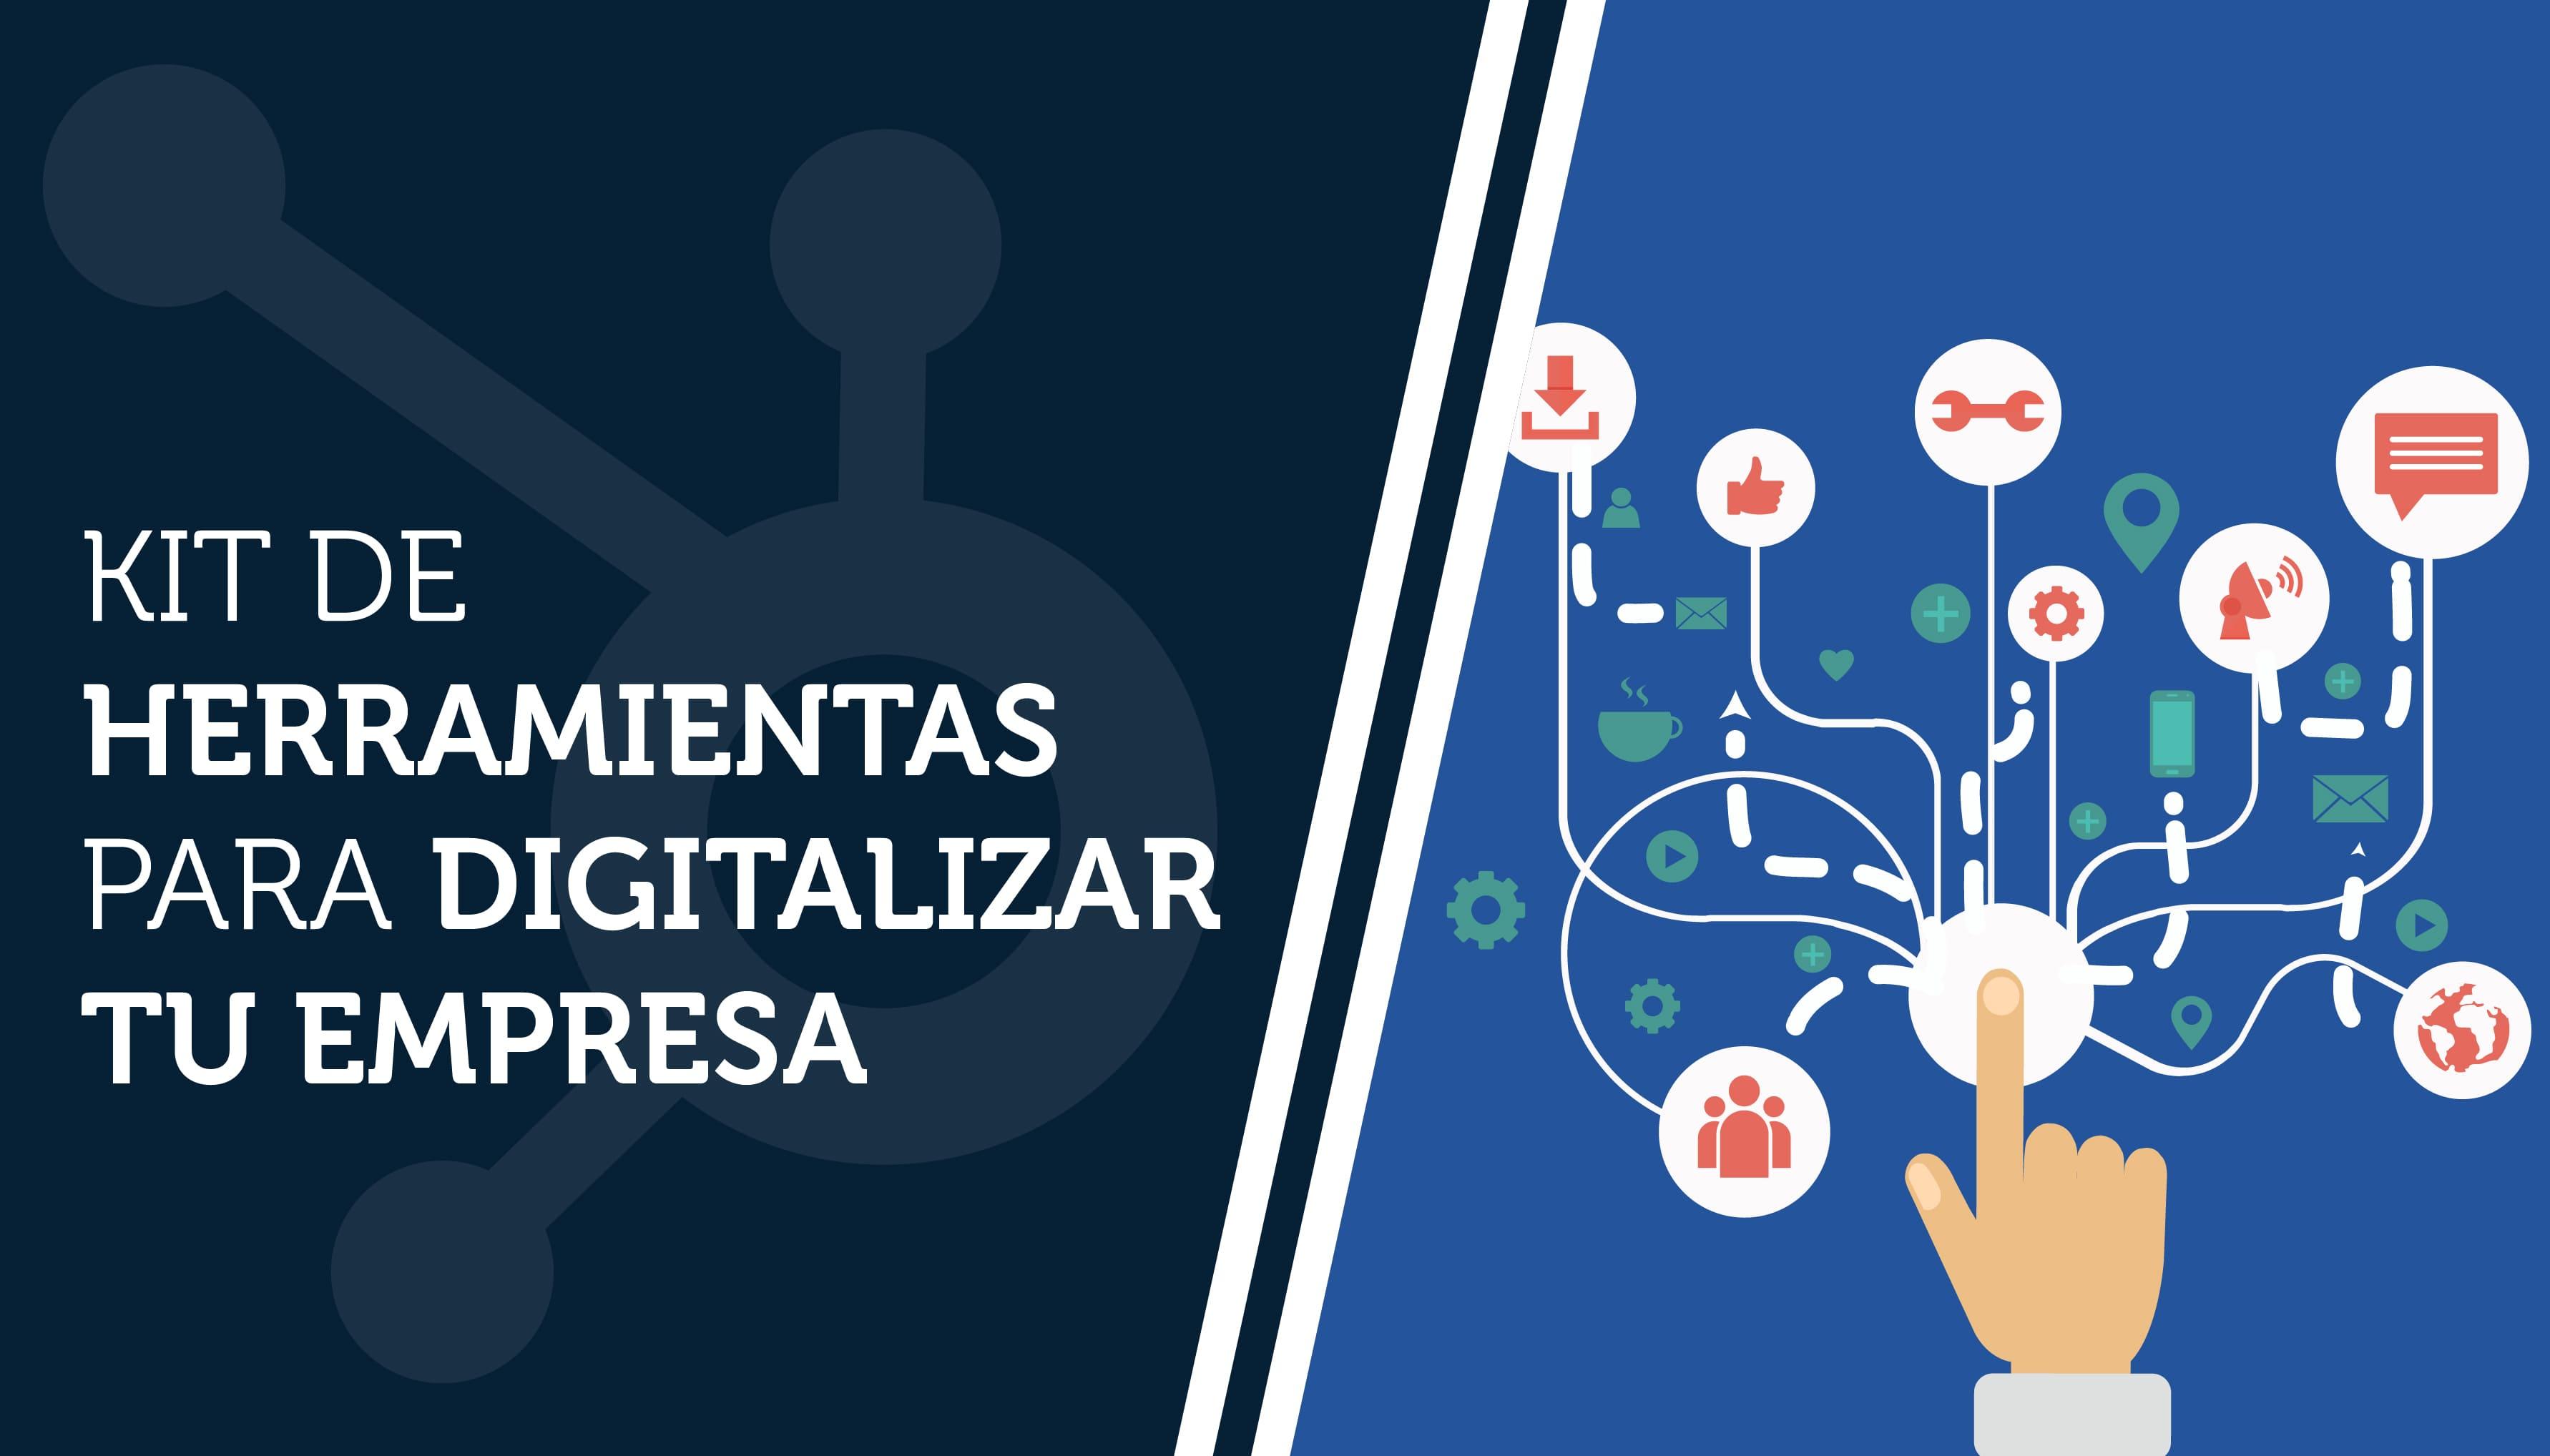 kit-de-herramientas- para-digitalizar-tu-empresa